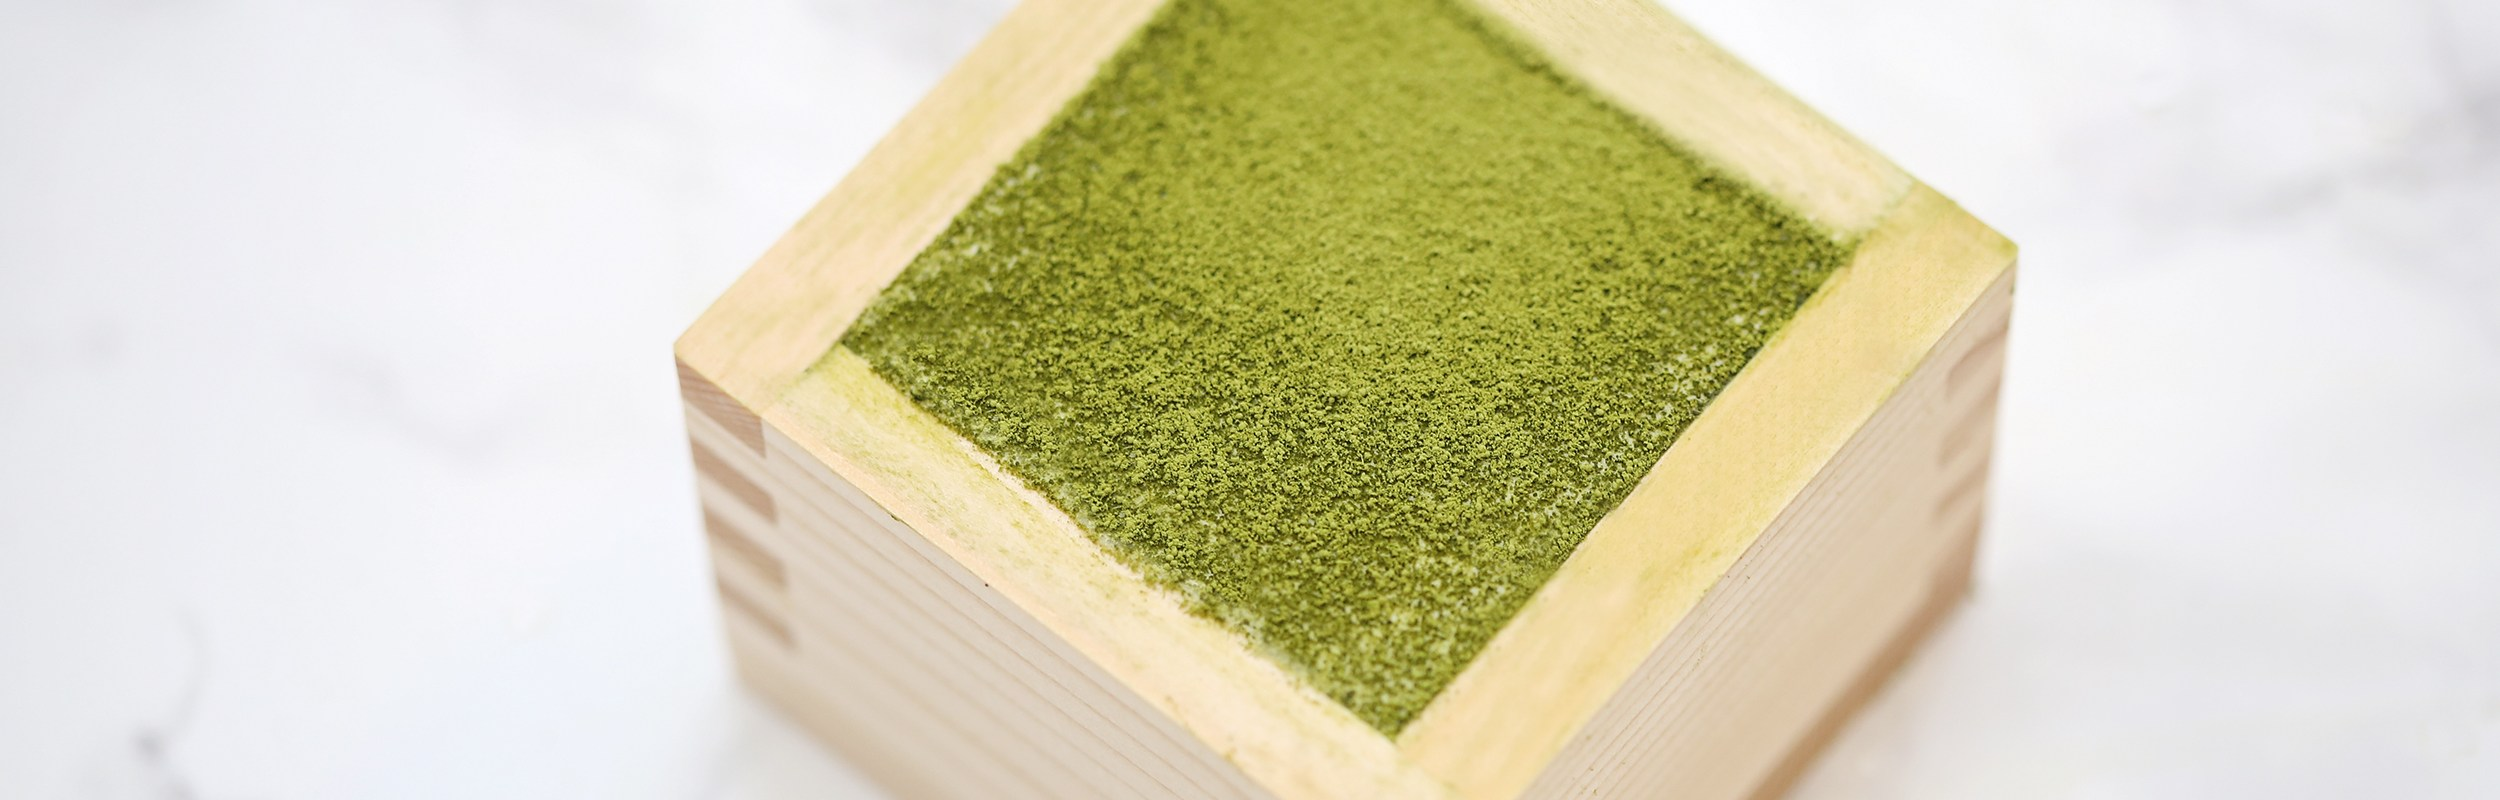 matcha tiramisu recipe- healthy ai blog